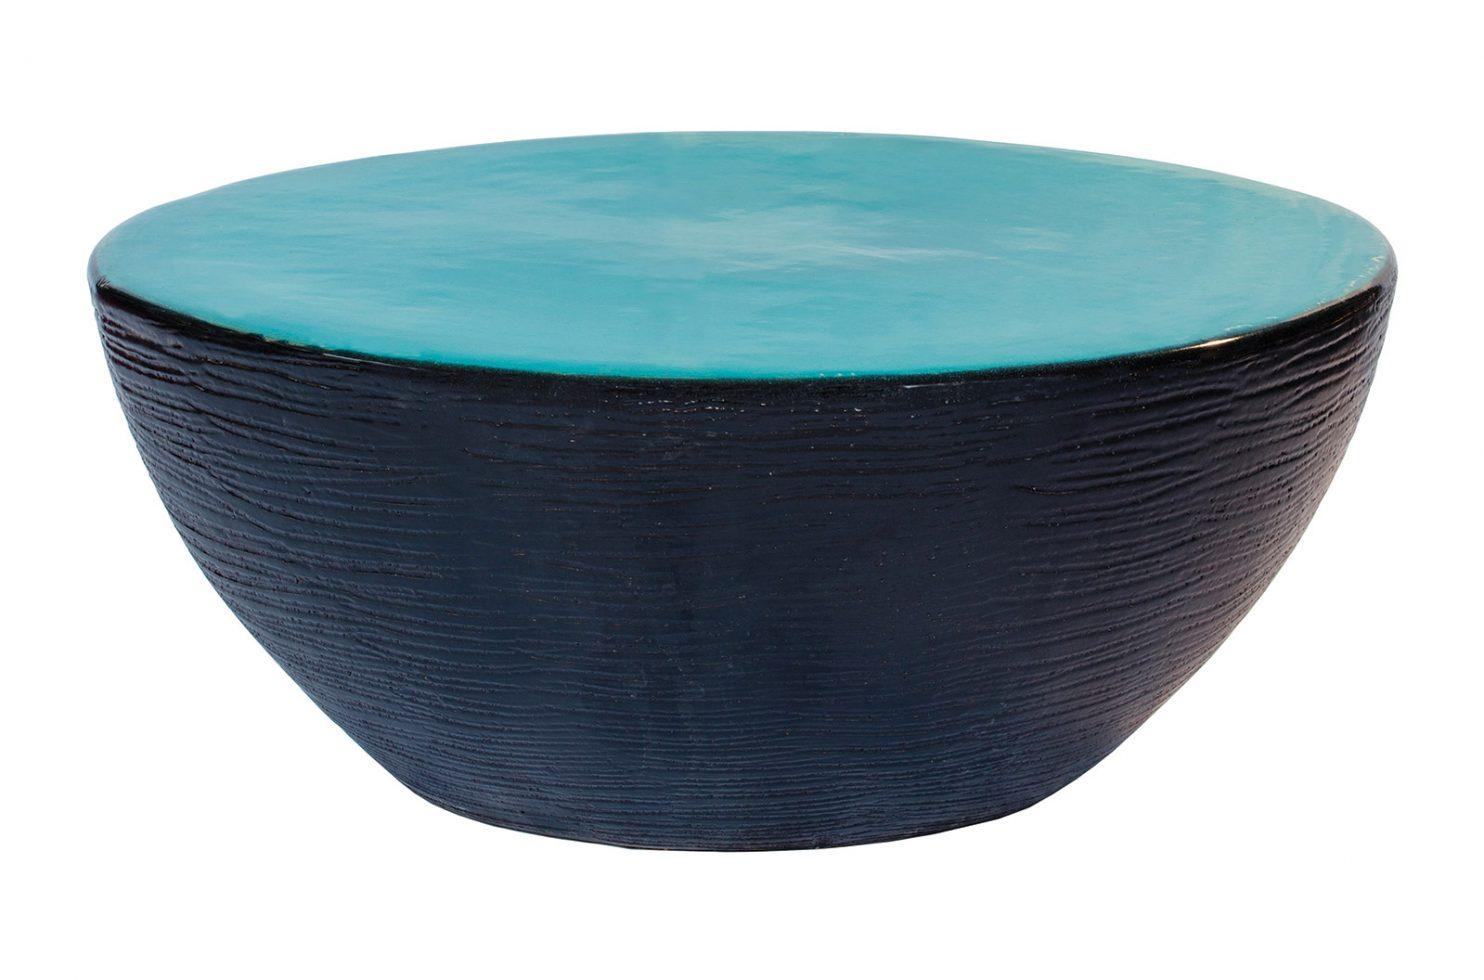 Ceramic Bowness 308FT293P2TBK